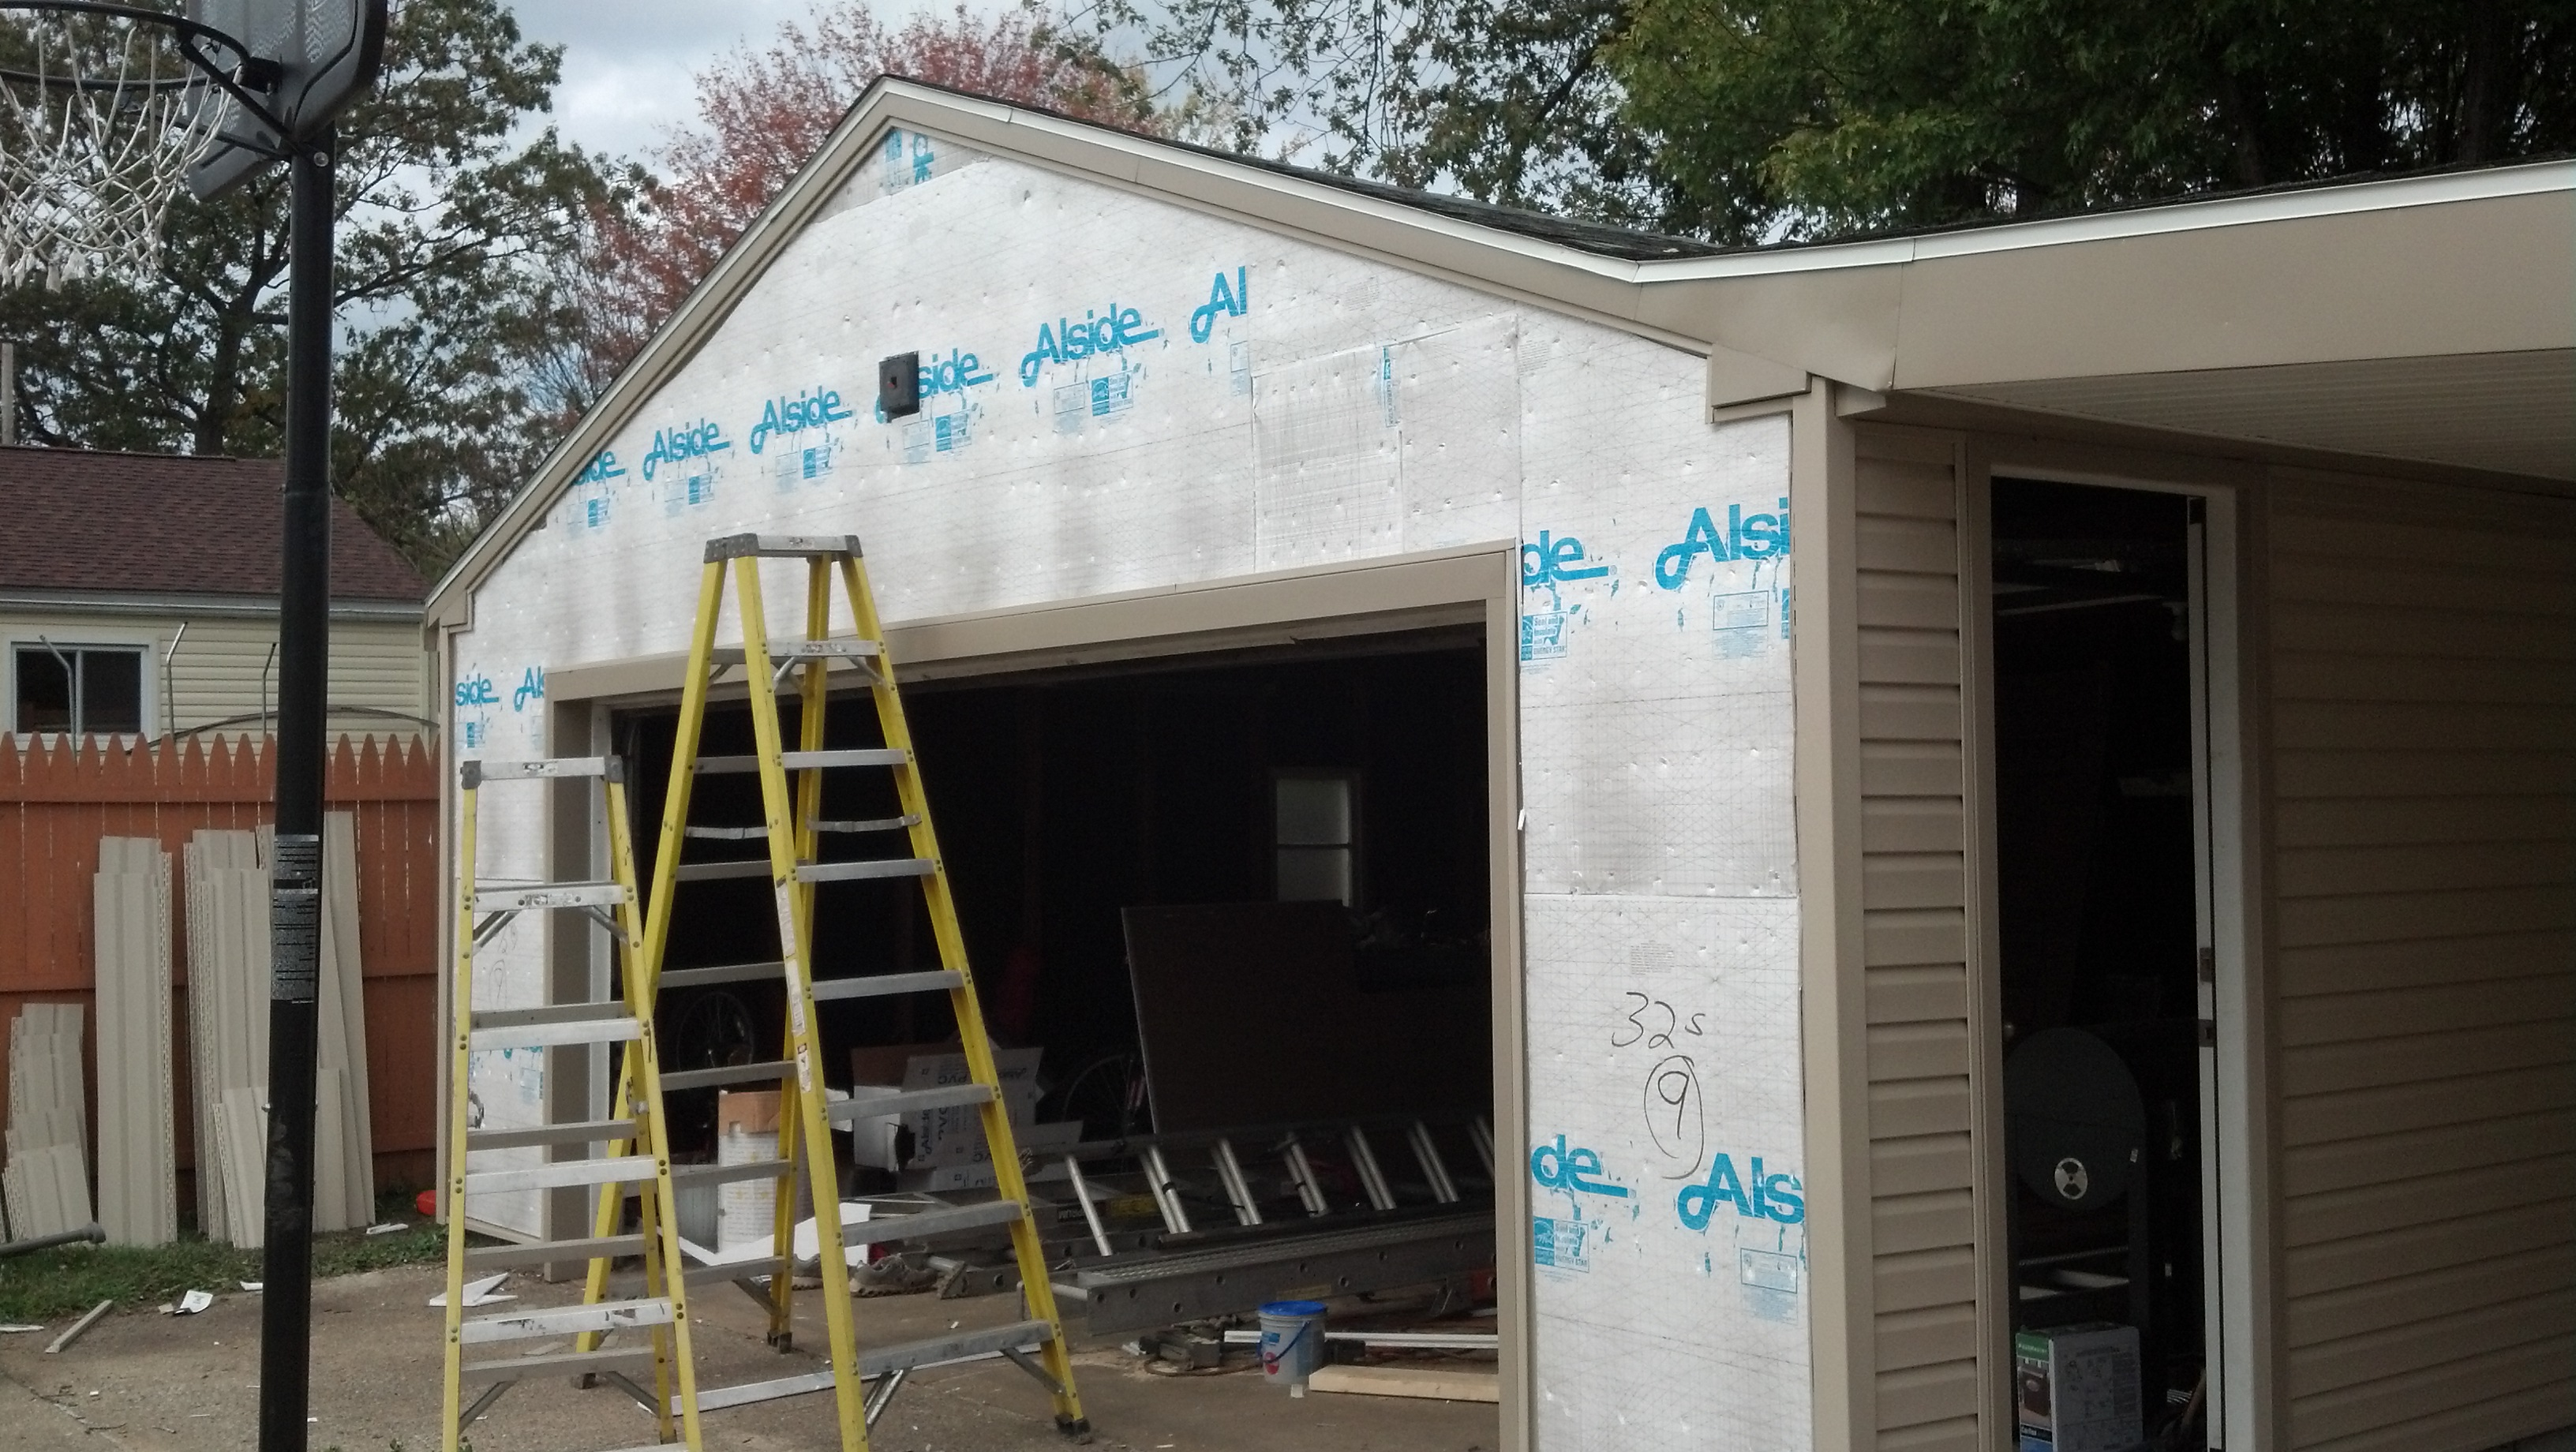 garage siding under repair